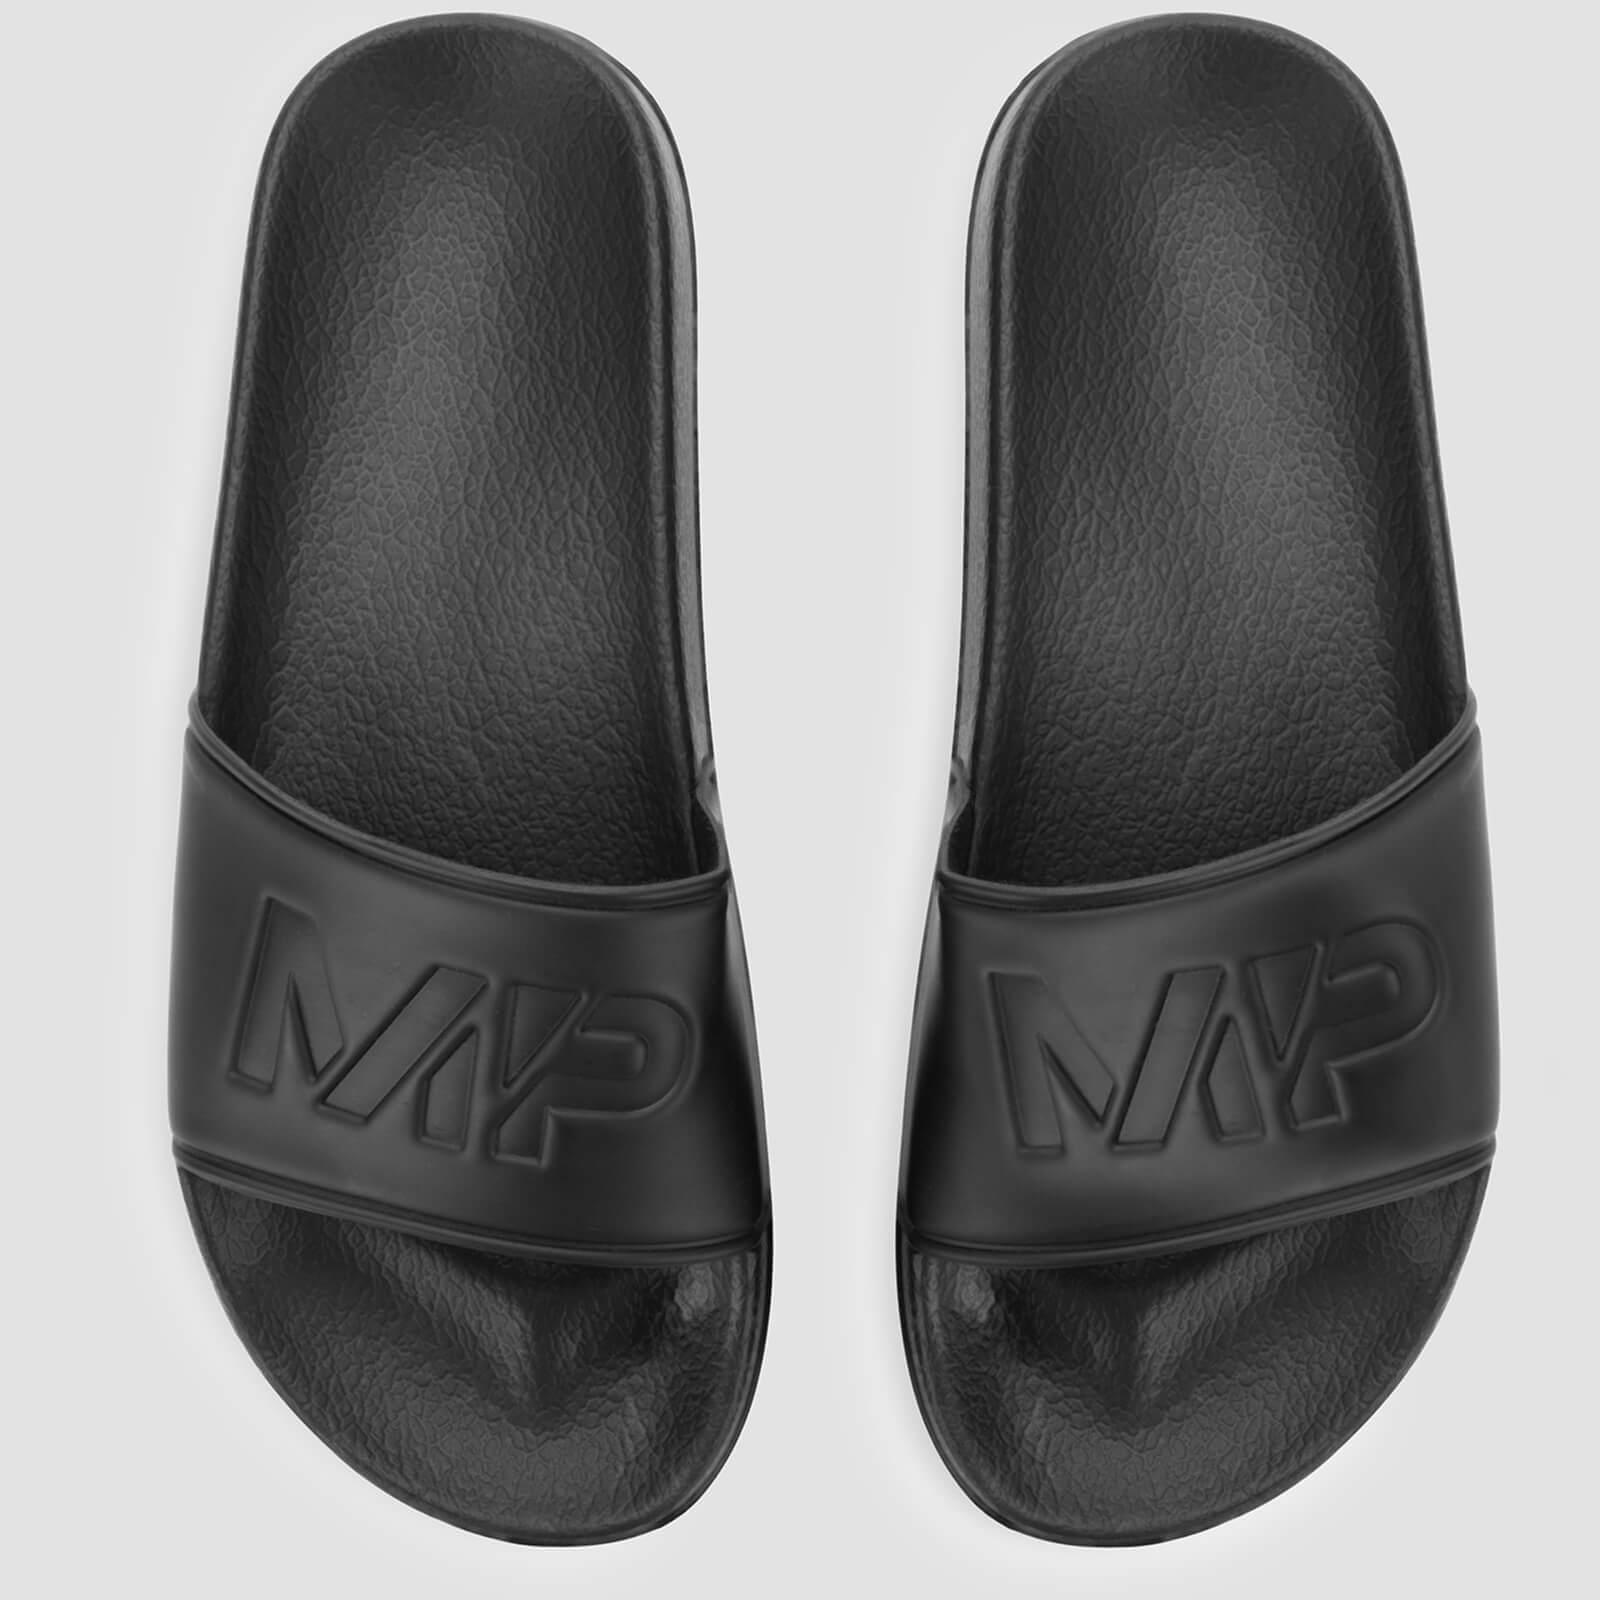 Myprotein MP Men's Sliders - Black - UK 10